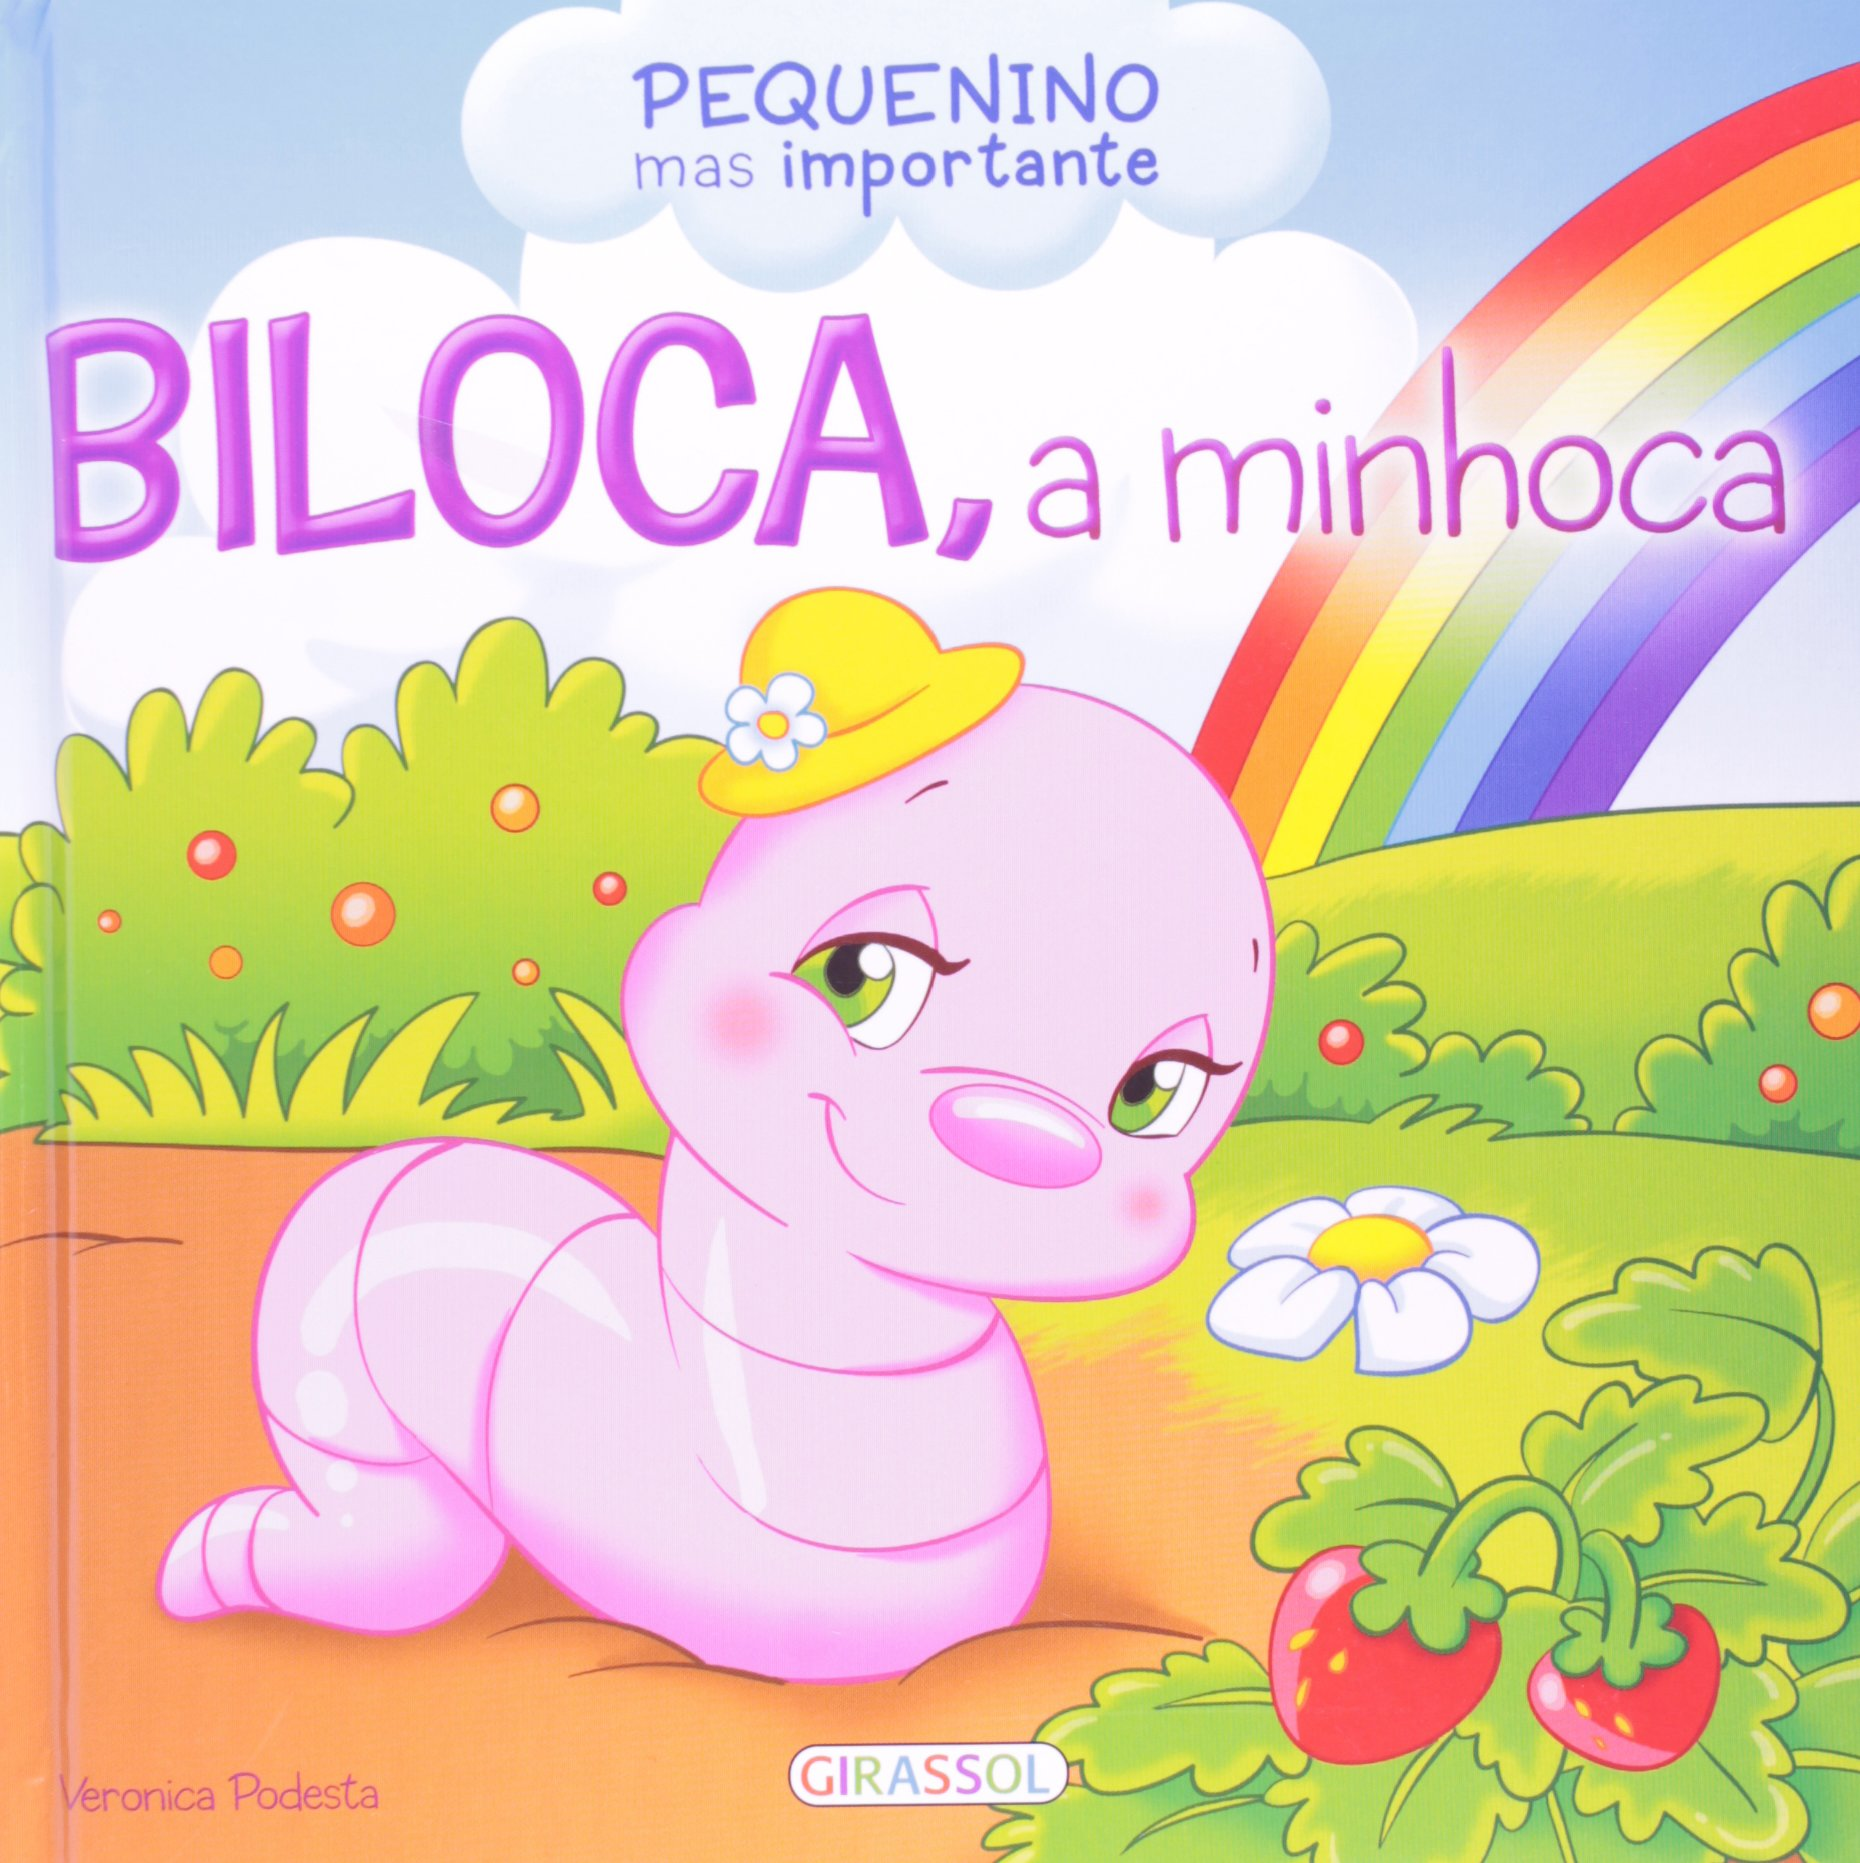 Read Online Biloca, A Minhoca - Pequenino Mas Importante pdf epub